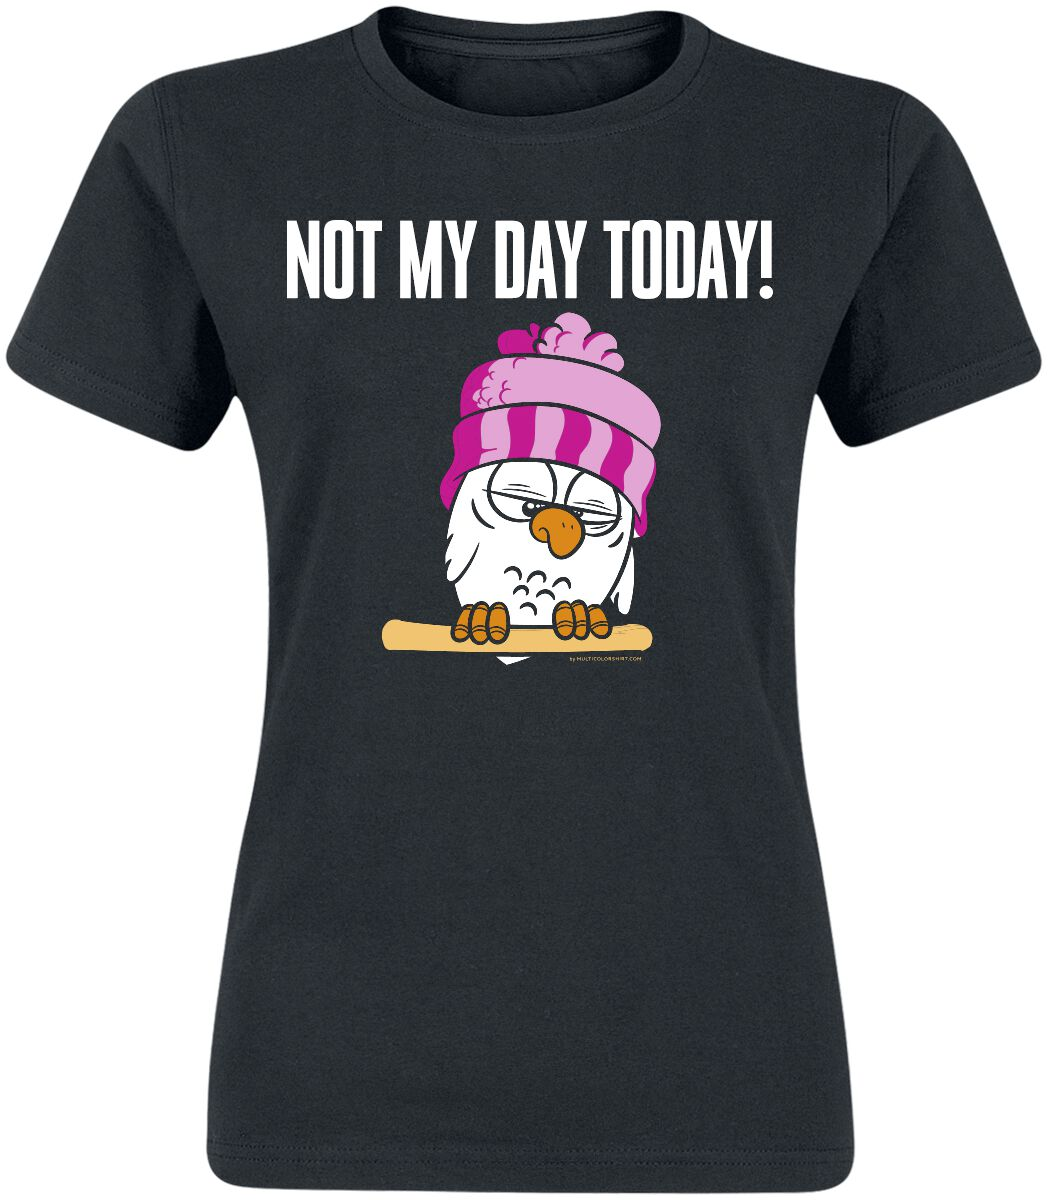 Not My Day Today T-Shirt schwarz B&C #150 (150)